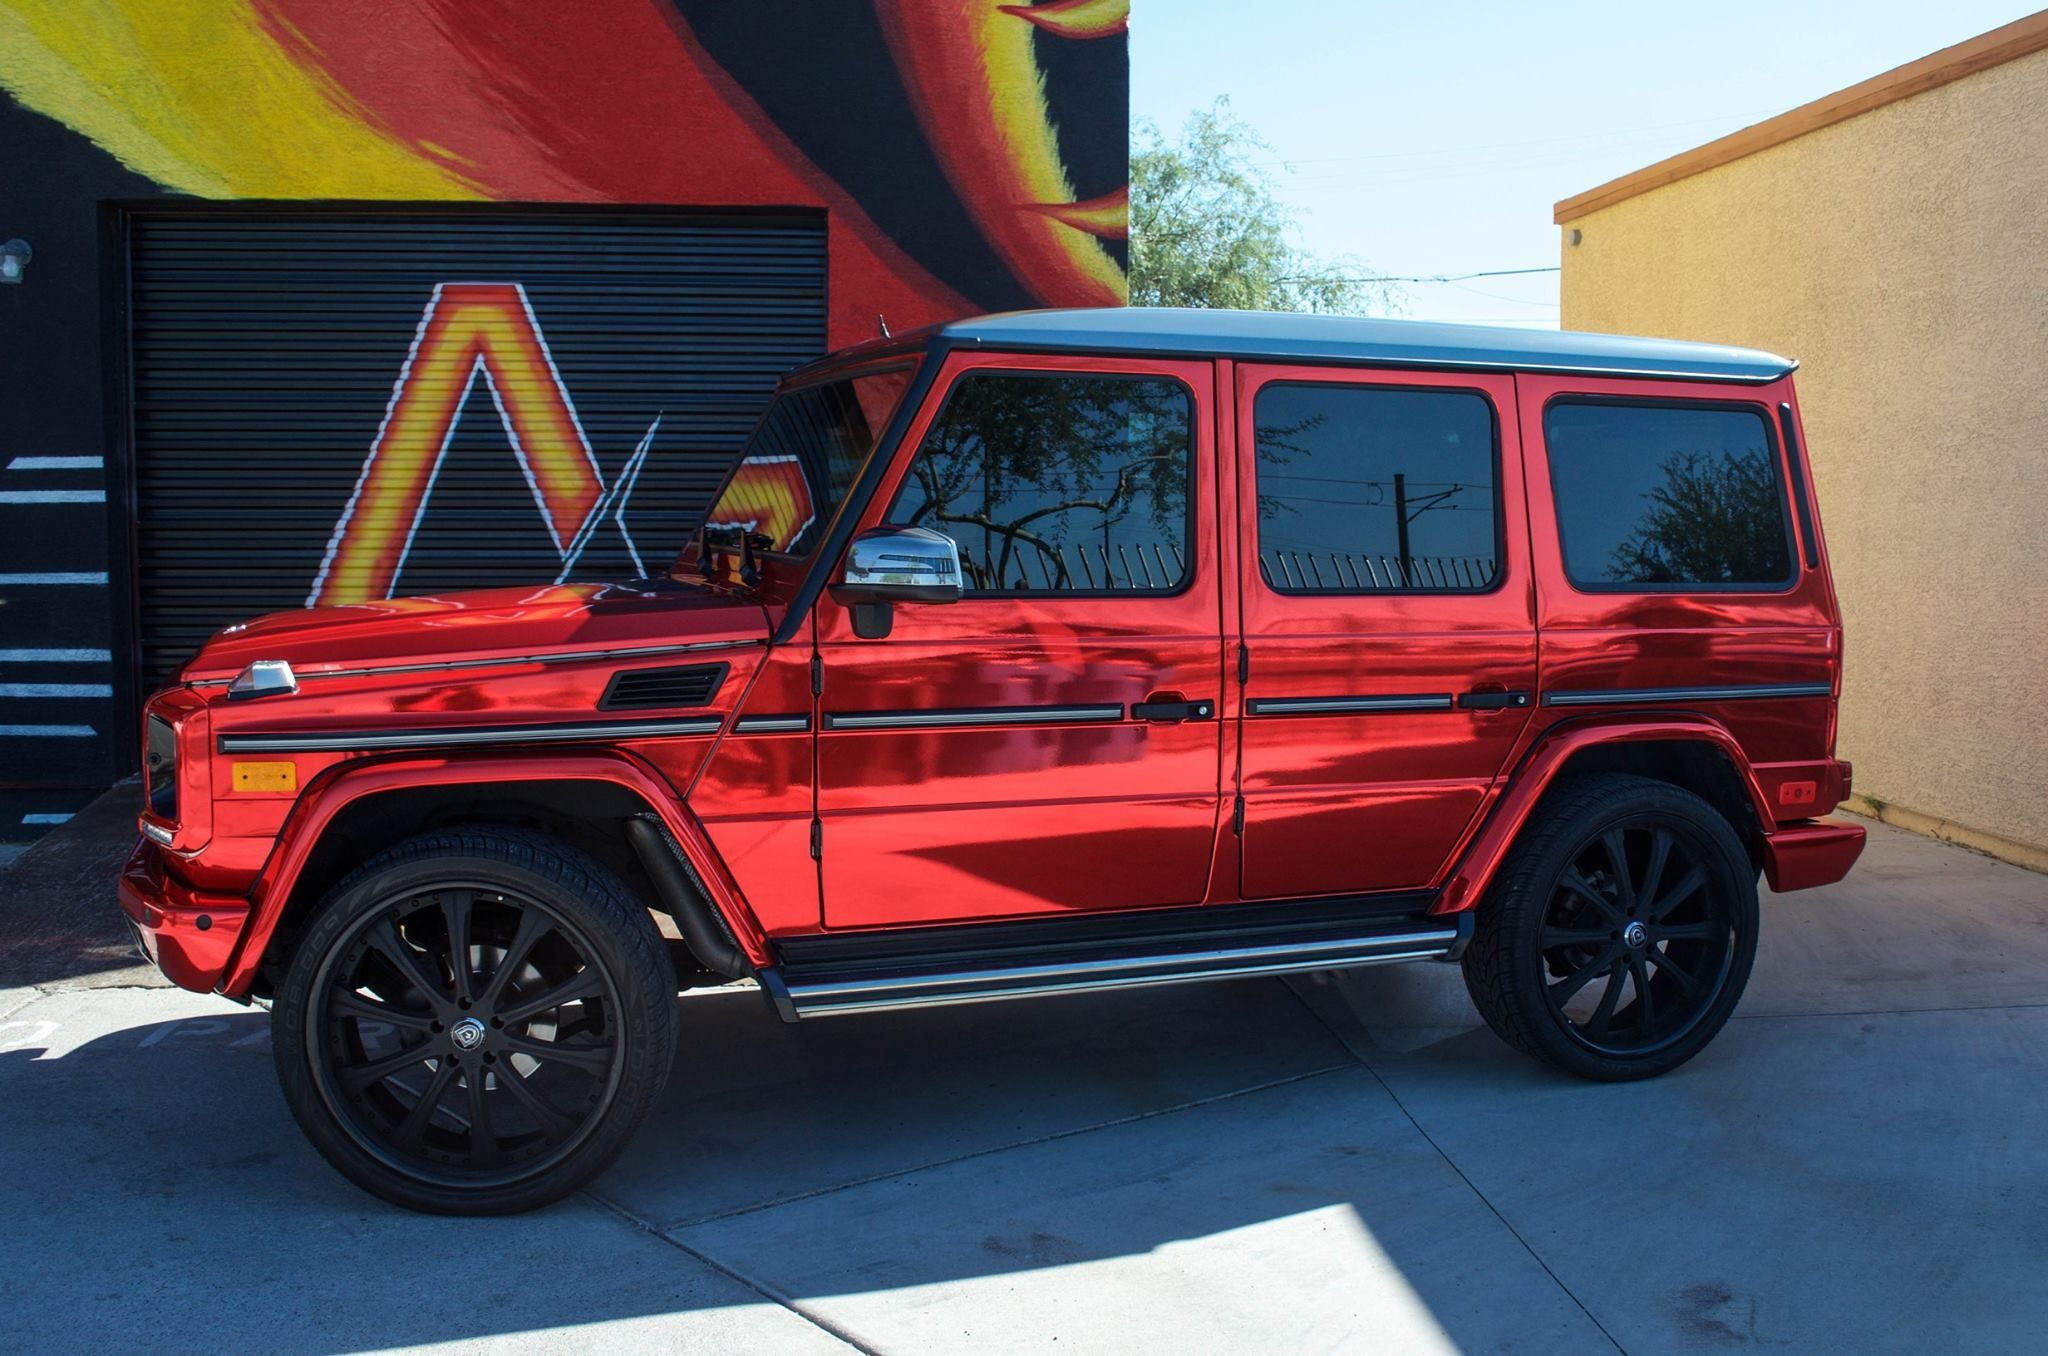 mercedes benz g wagon factory white red chrome black chrome - G Wagon Red Interior